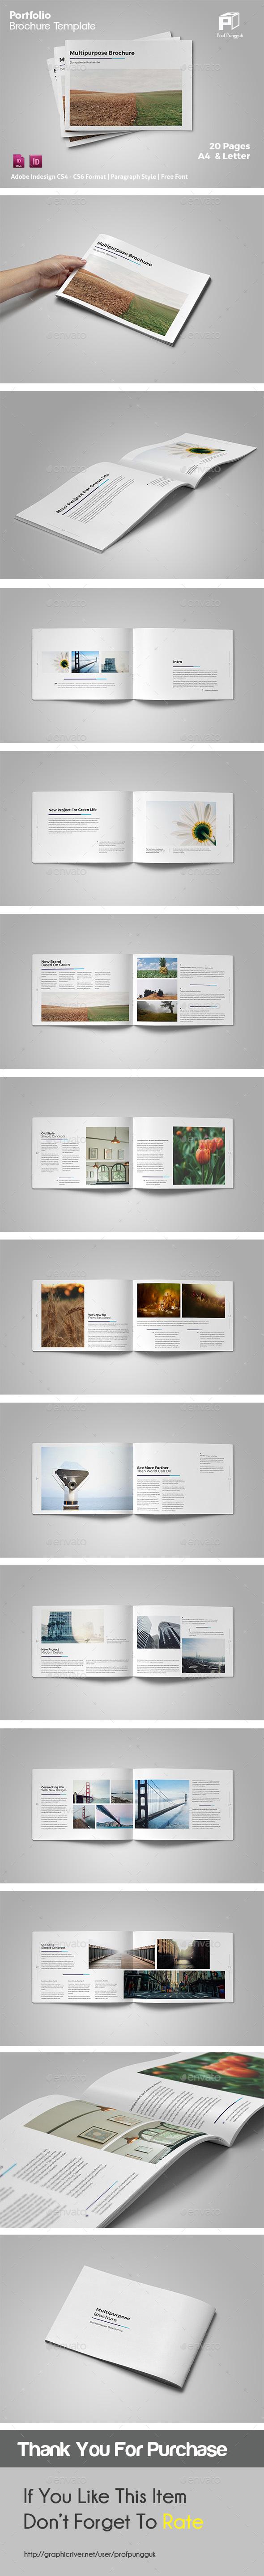 Clean Multipurpose Brochure Vol.2 - Portfolio Brochures